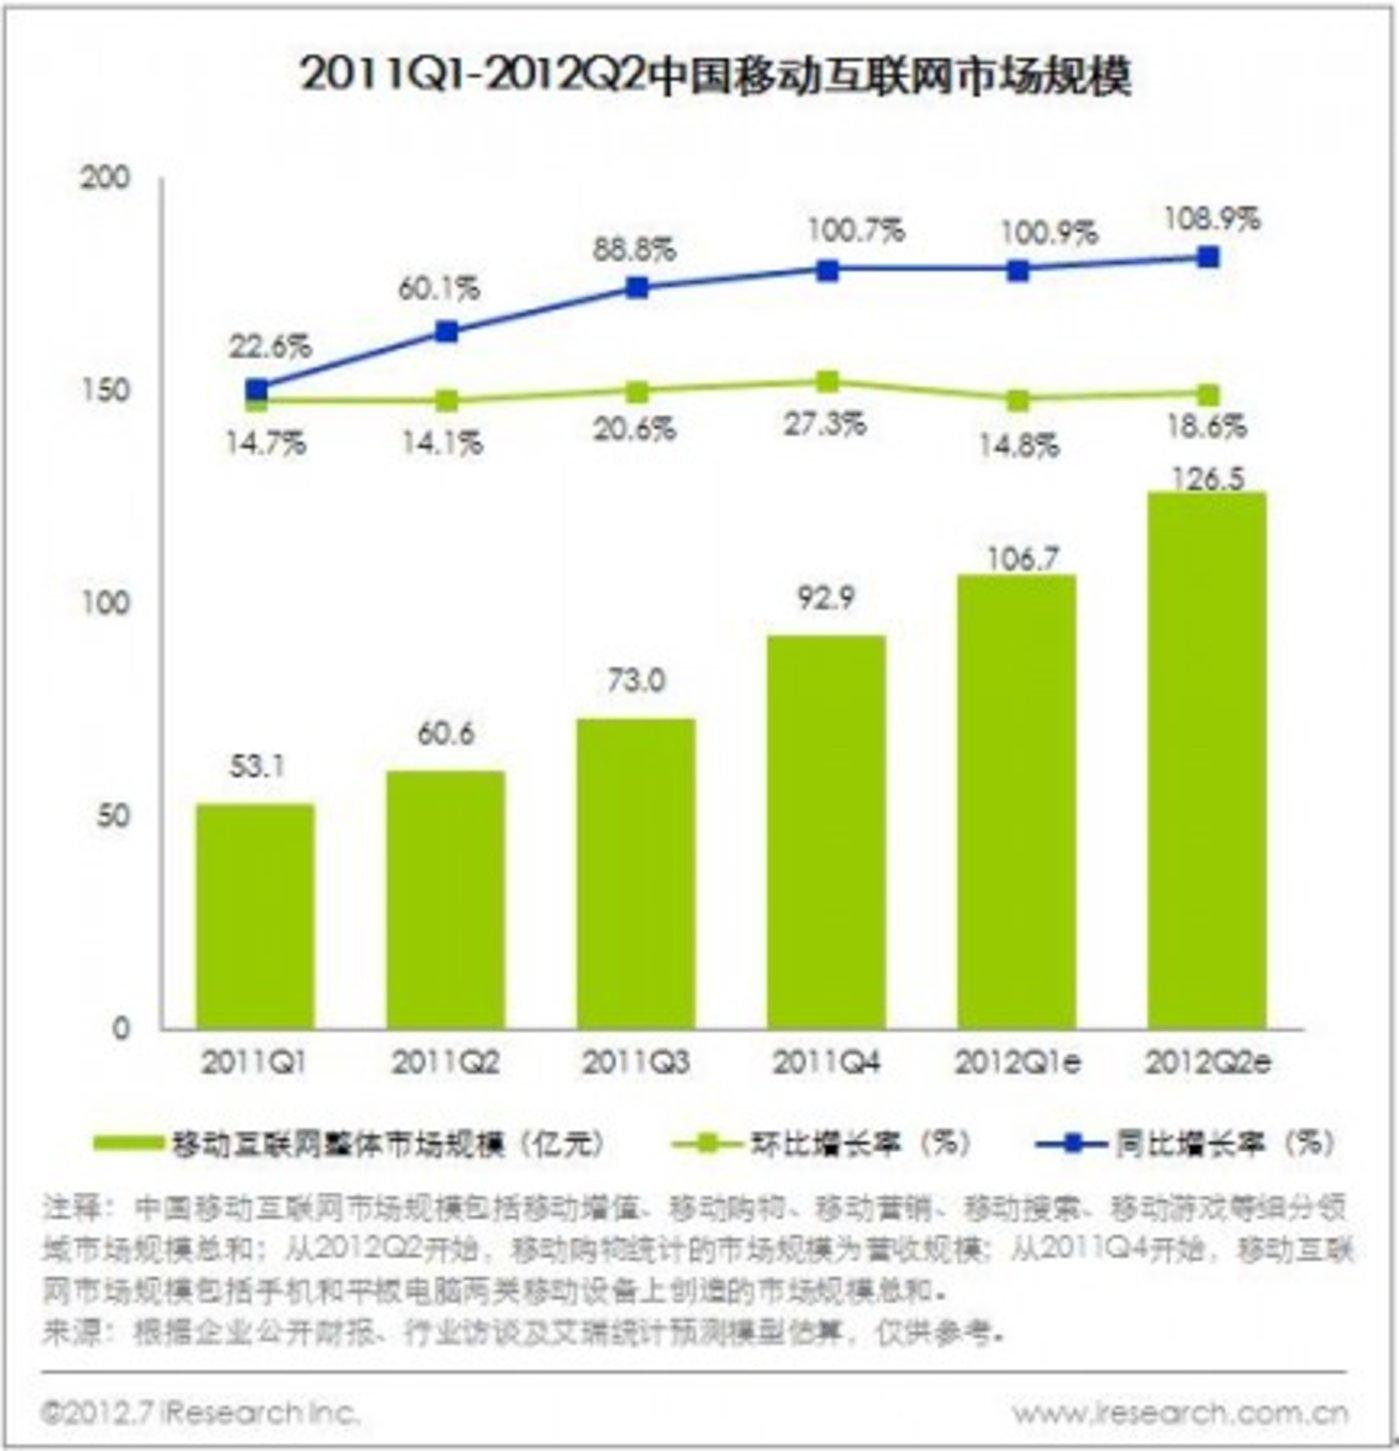 2011Q1-2012Q2中国移动互联网市场规模